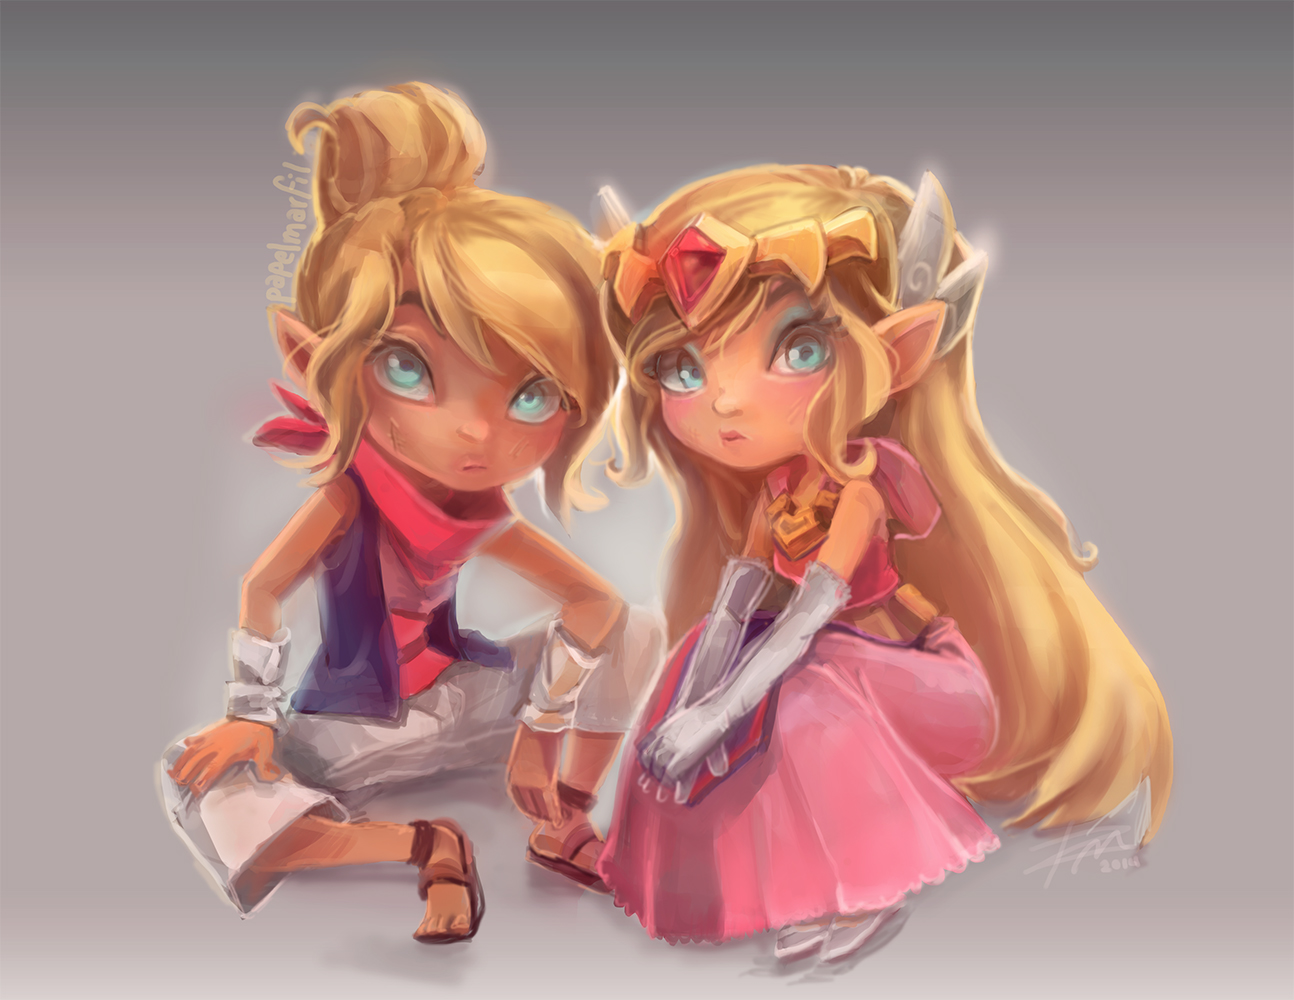 The Legend of Zelda - Zelda and Tetra by papelmarfil